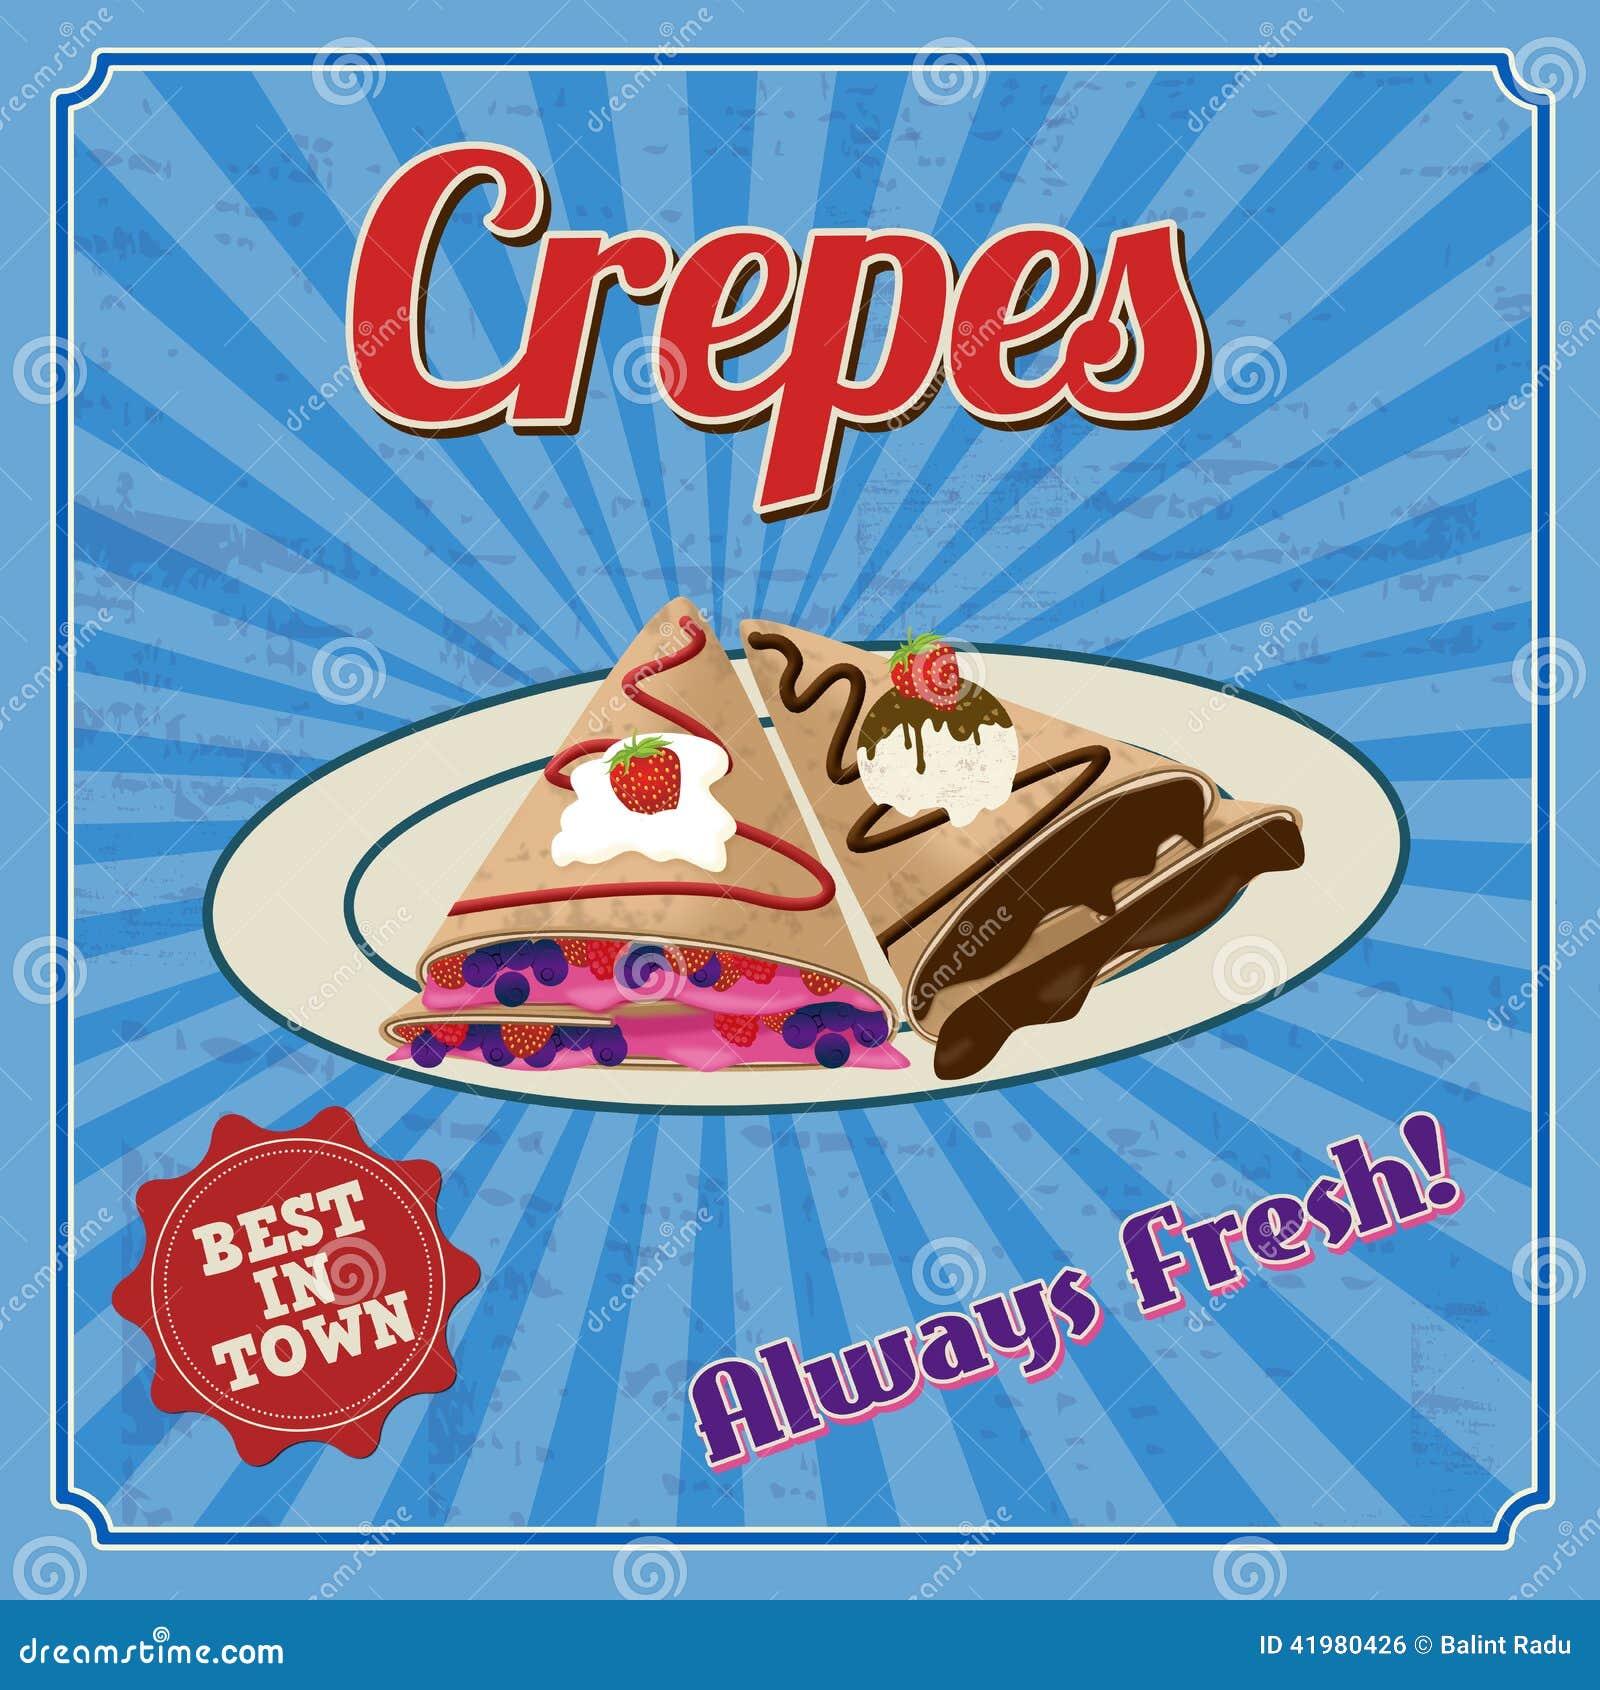 Crepes Retro Poster Stock Vector Illustration Of Crape 41980426